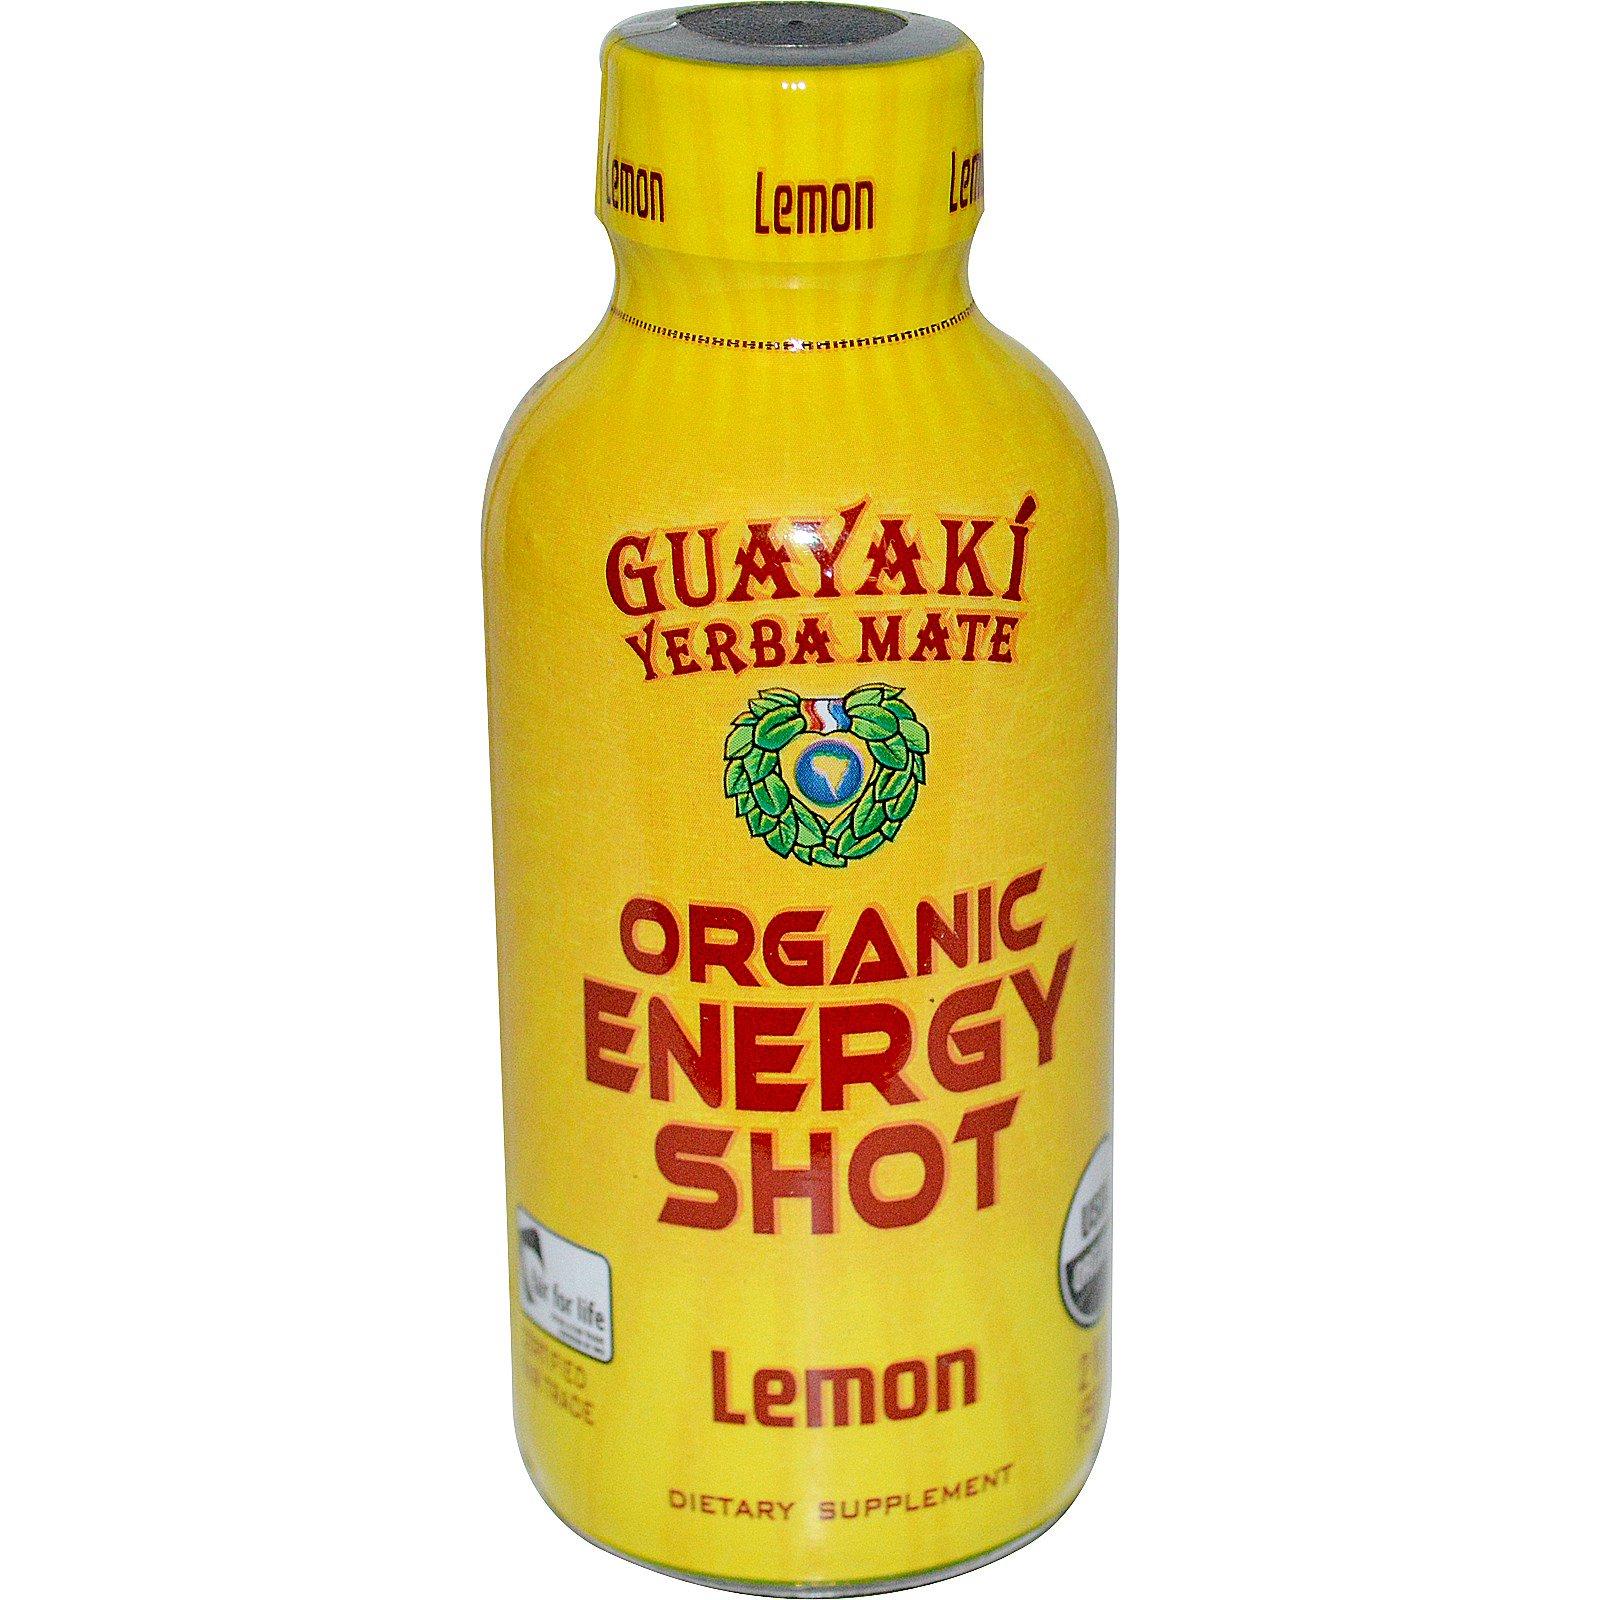 Guayaki, Yerba Mate, Organic Energy Shot, Lemon, 2 fl oz (59